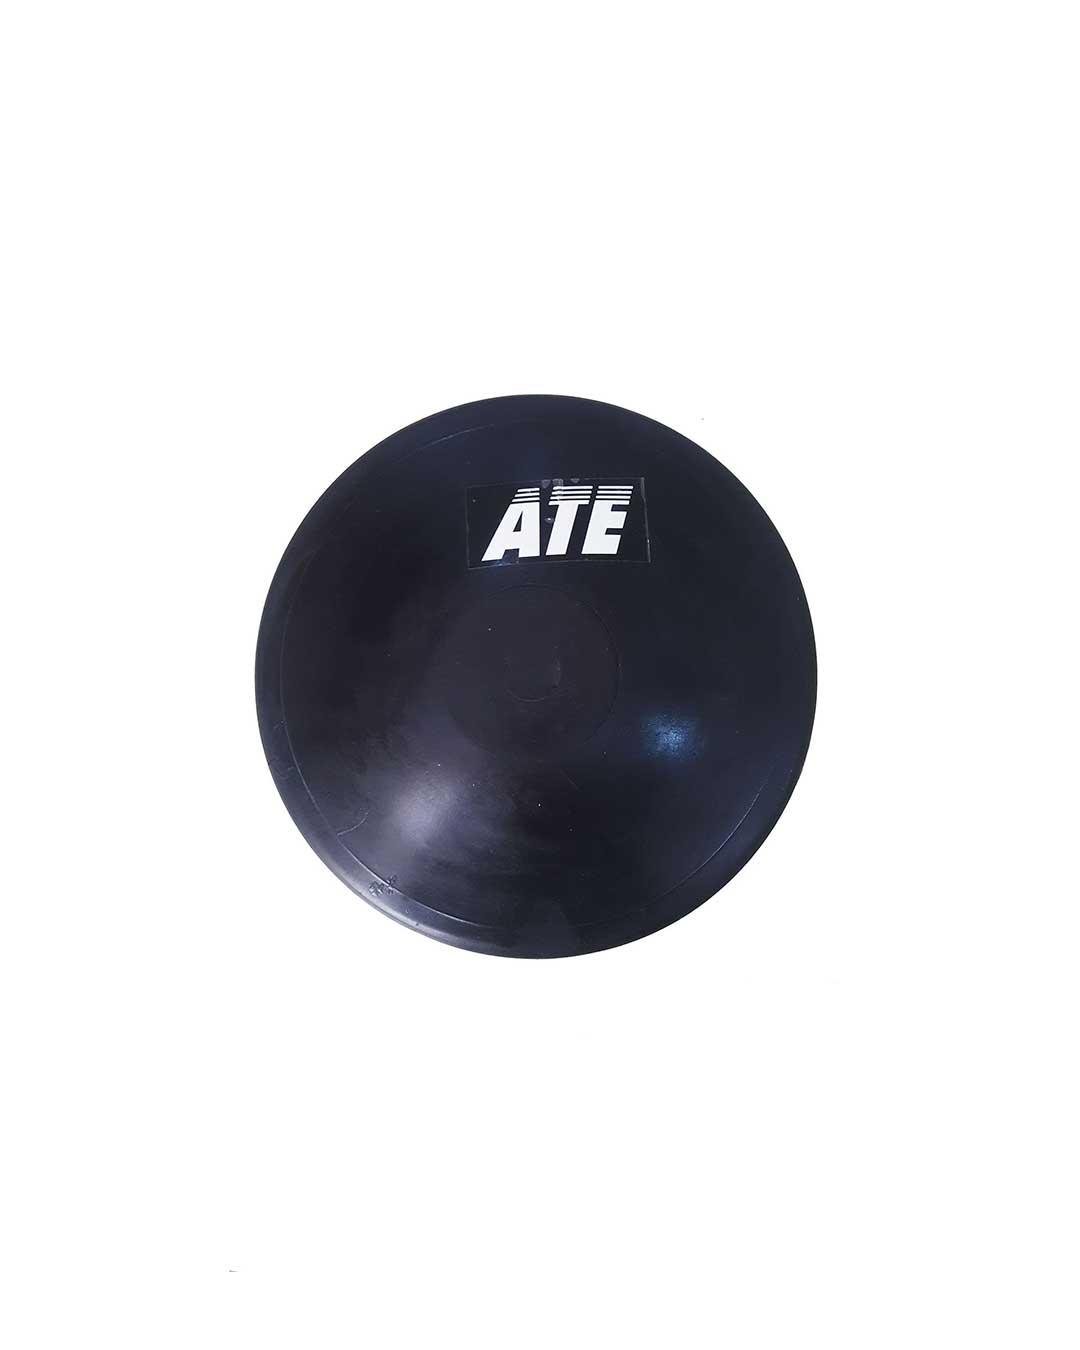 Disco de atletismo de goma